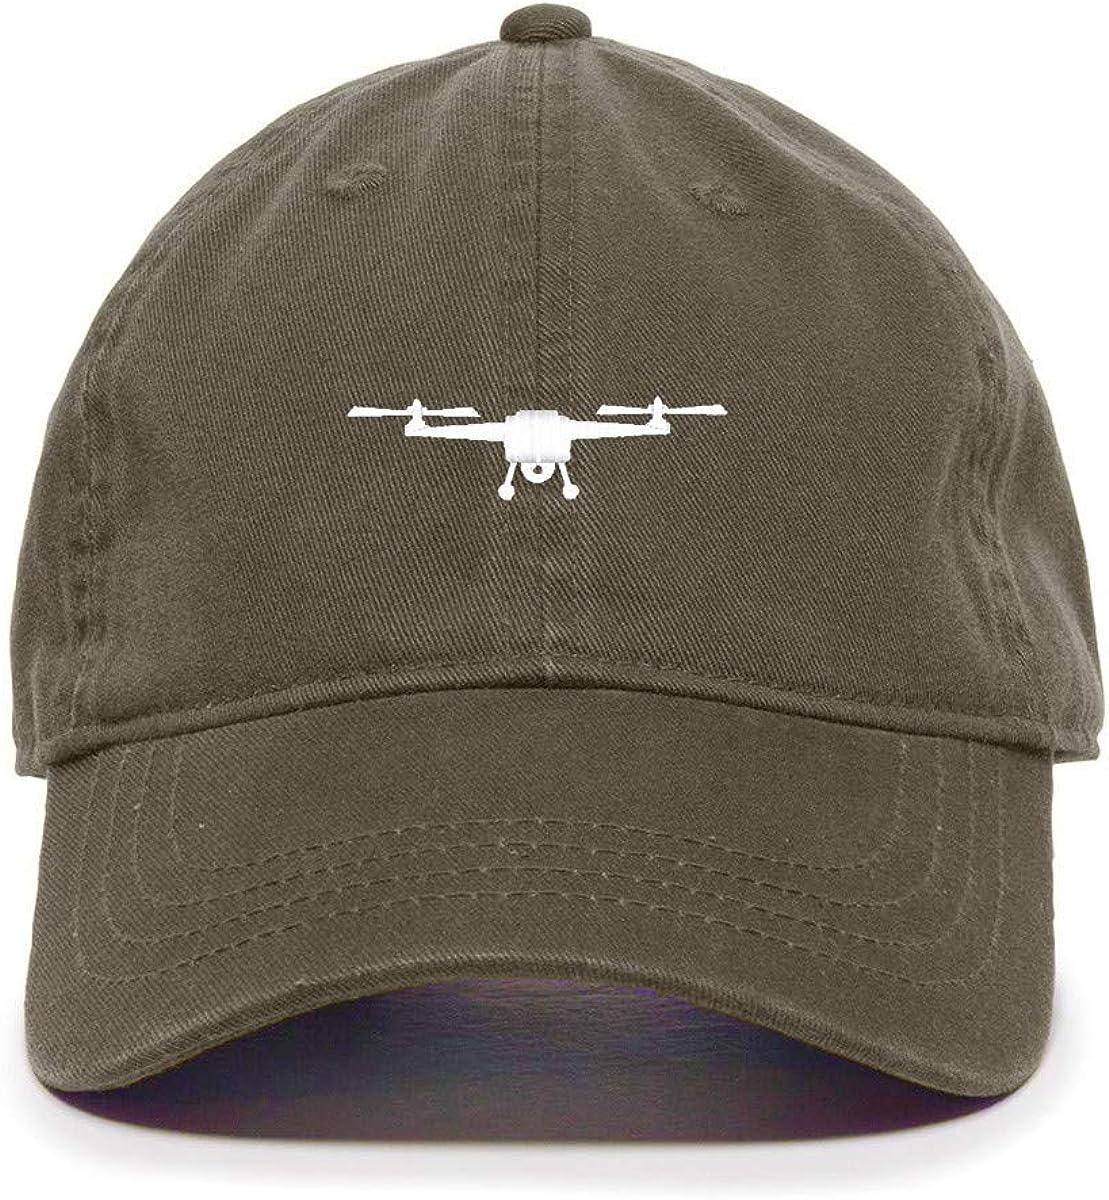 Tech Design Drone Symbol Baseball Cap Denver Mall Embroidered Adjusta Cotton New sales